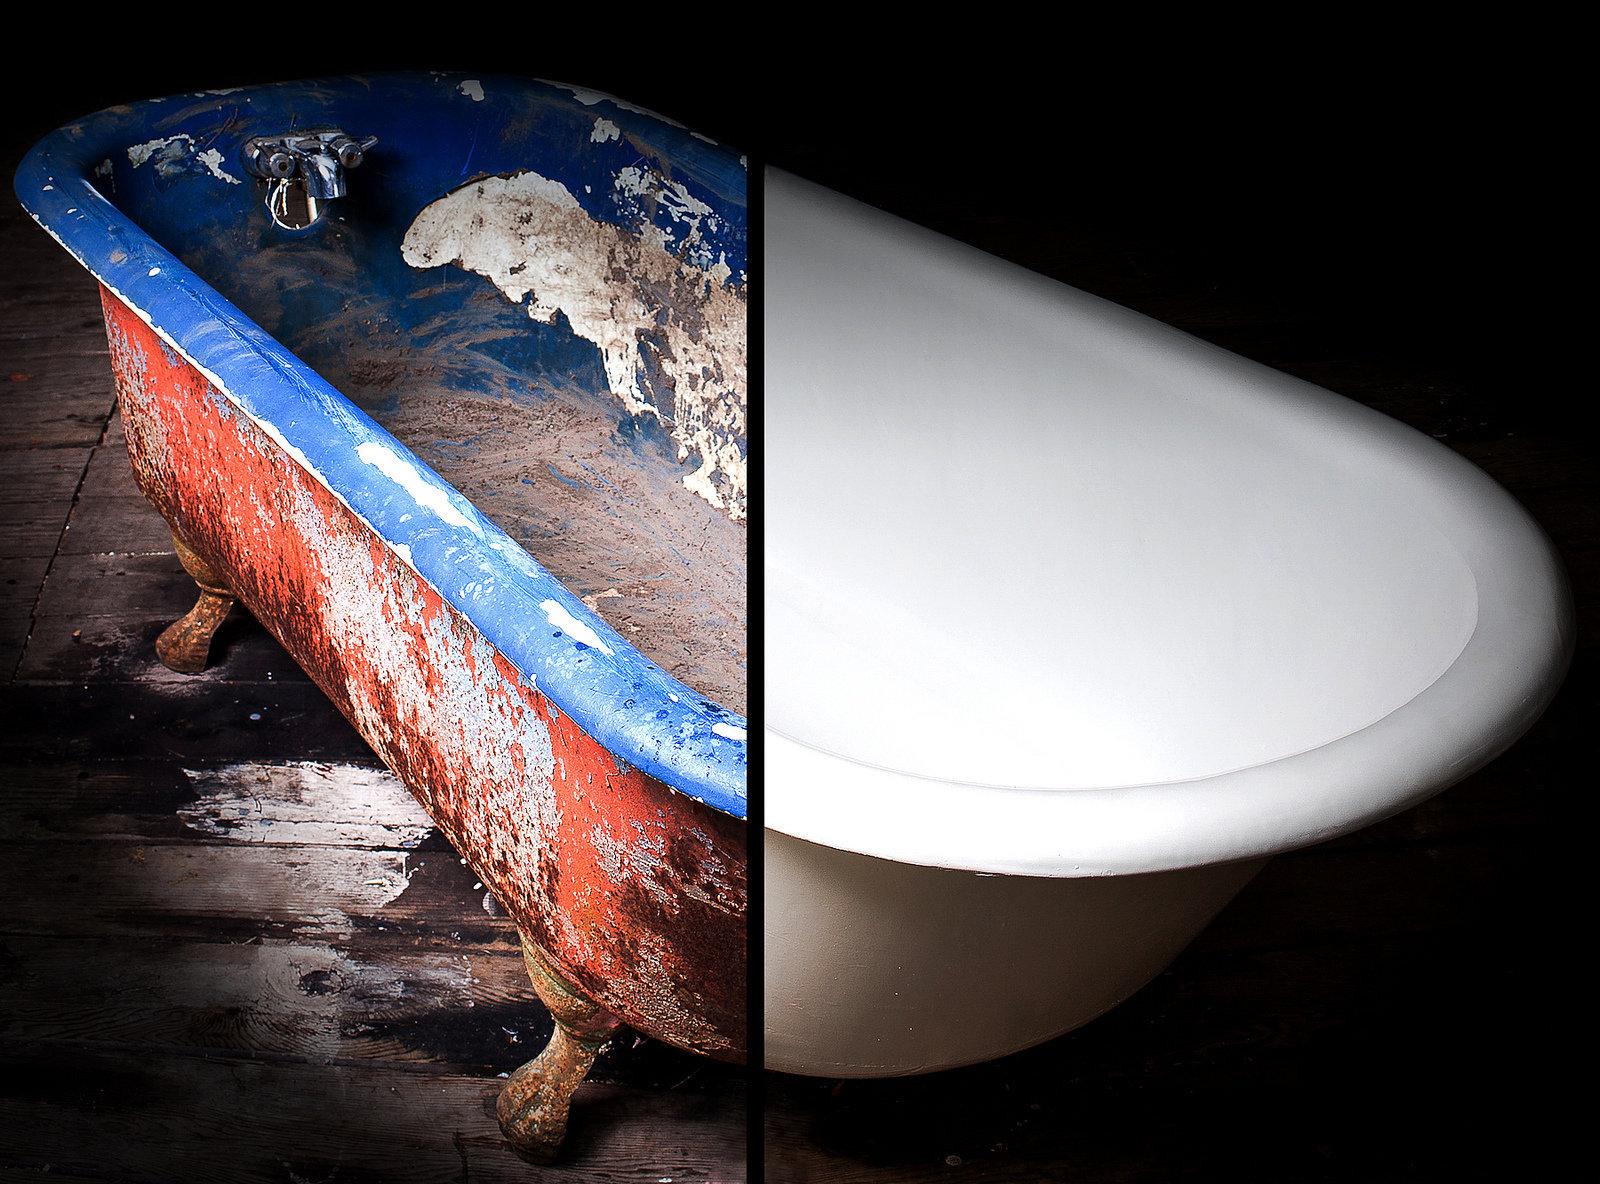 Refinish A Classic Claw Foot Tub - Detroit 586-296-1100 | Tub ...